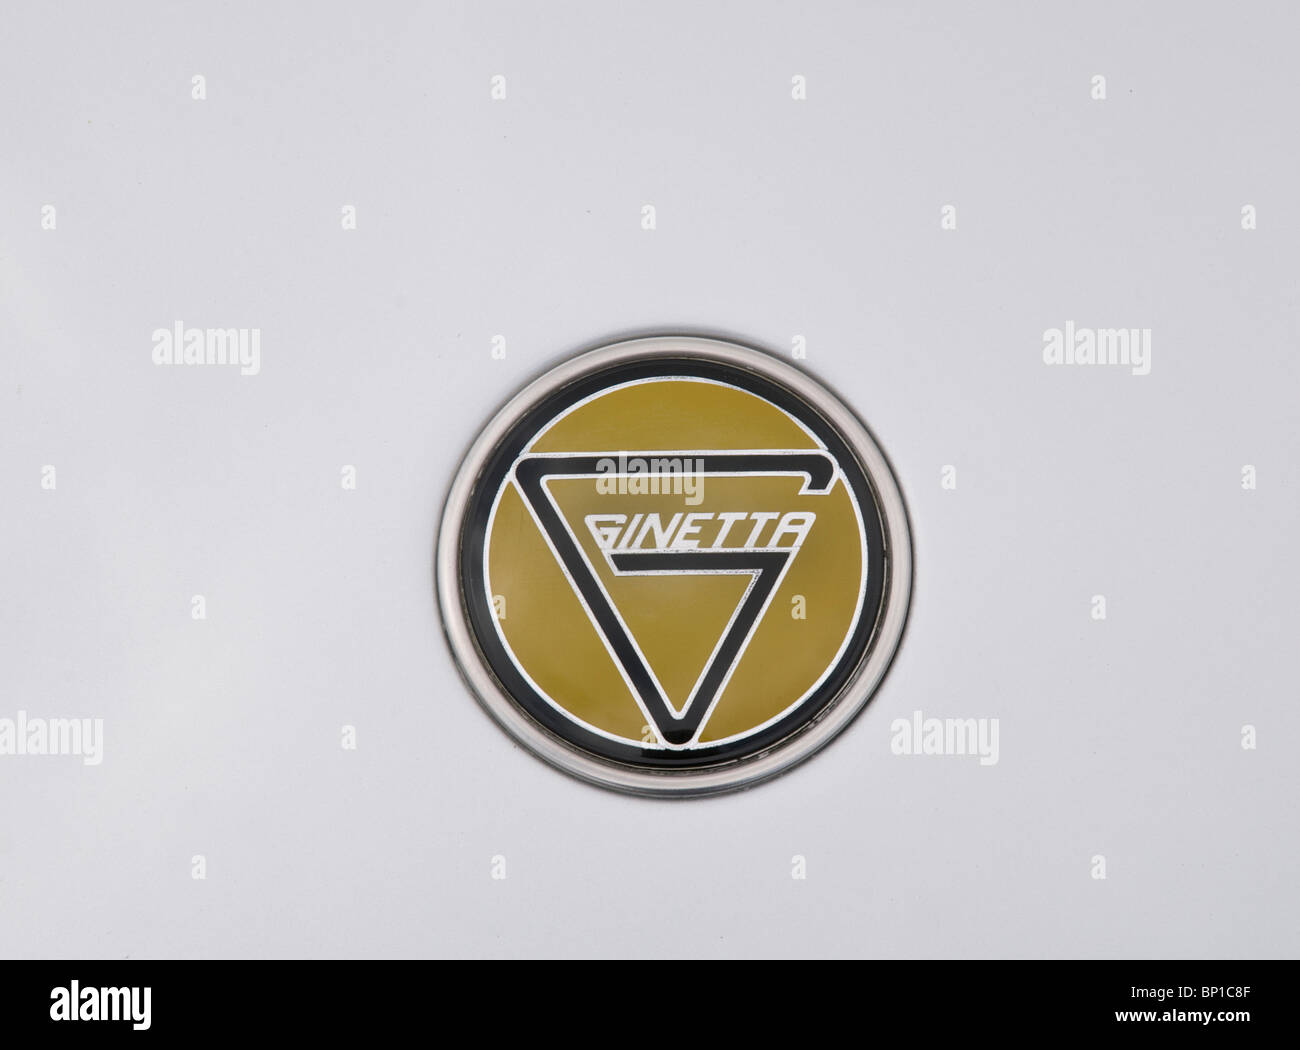 Ginetta badge - Stock Image